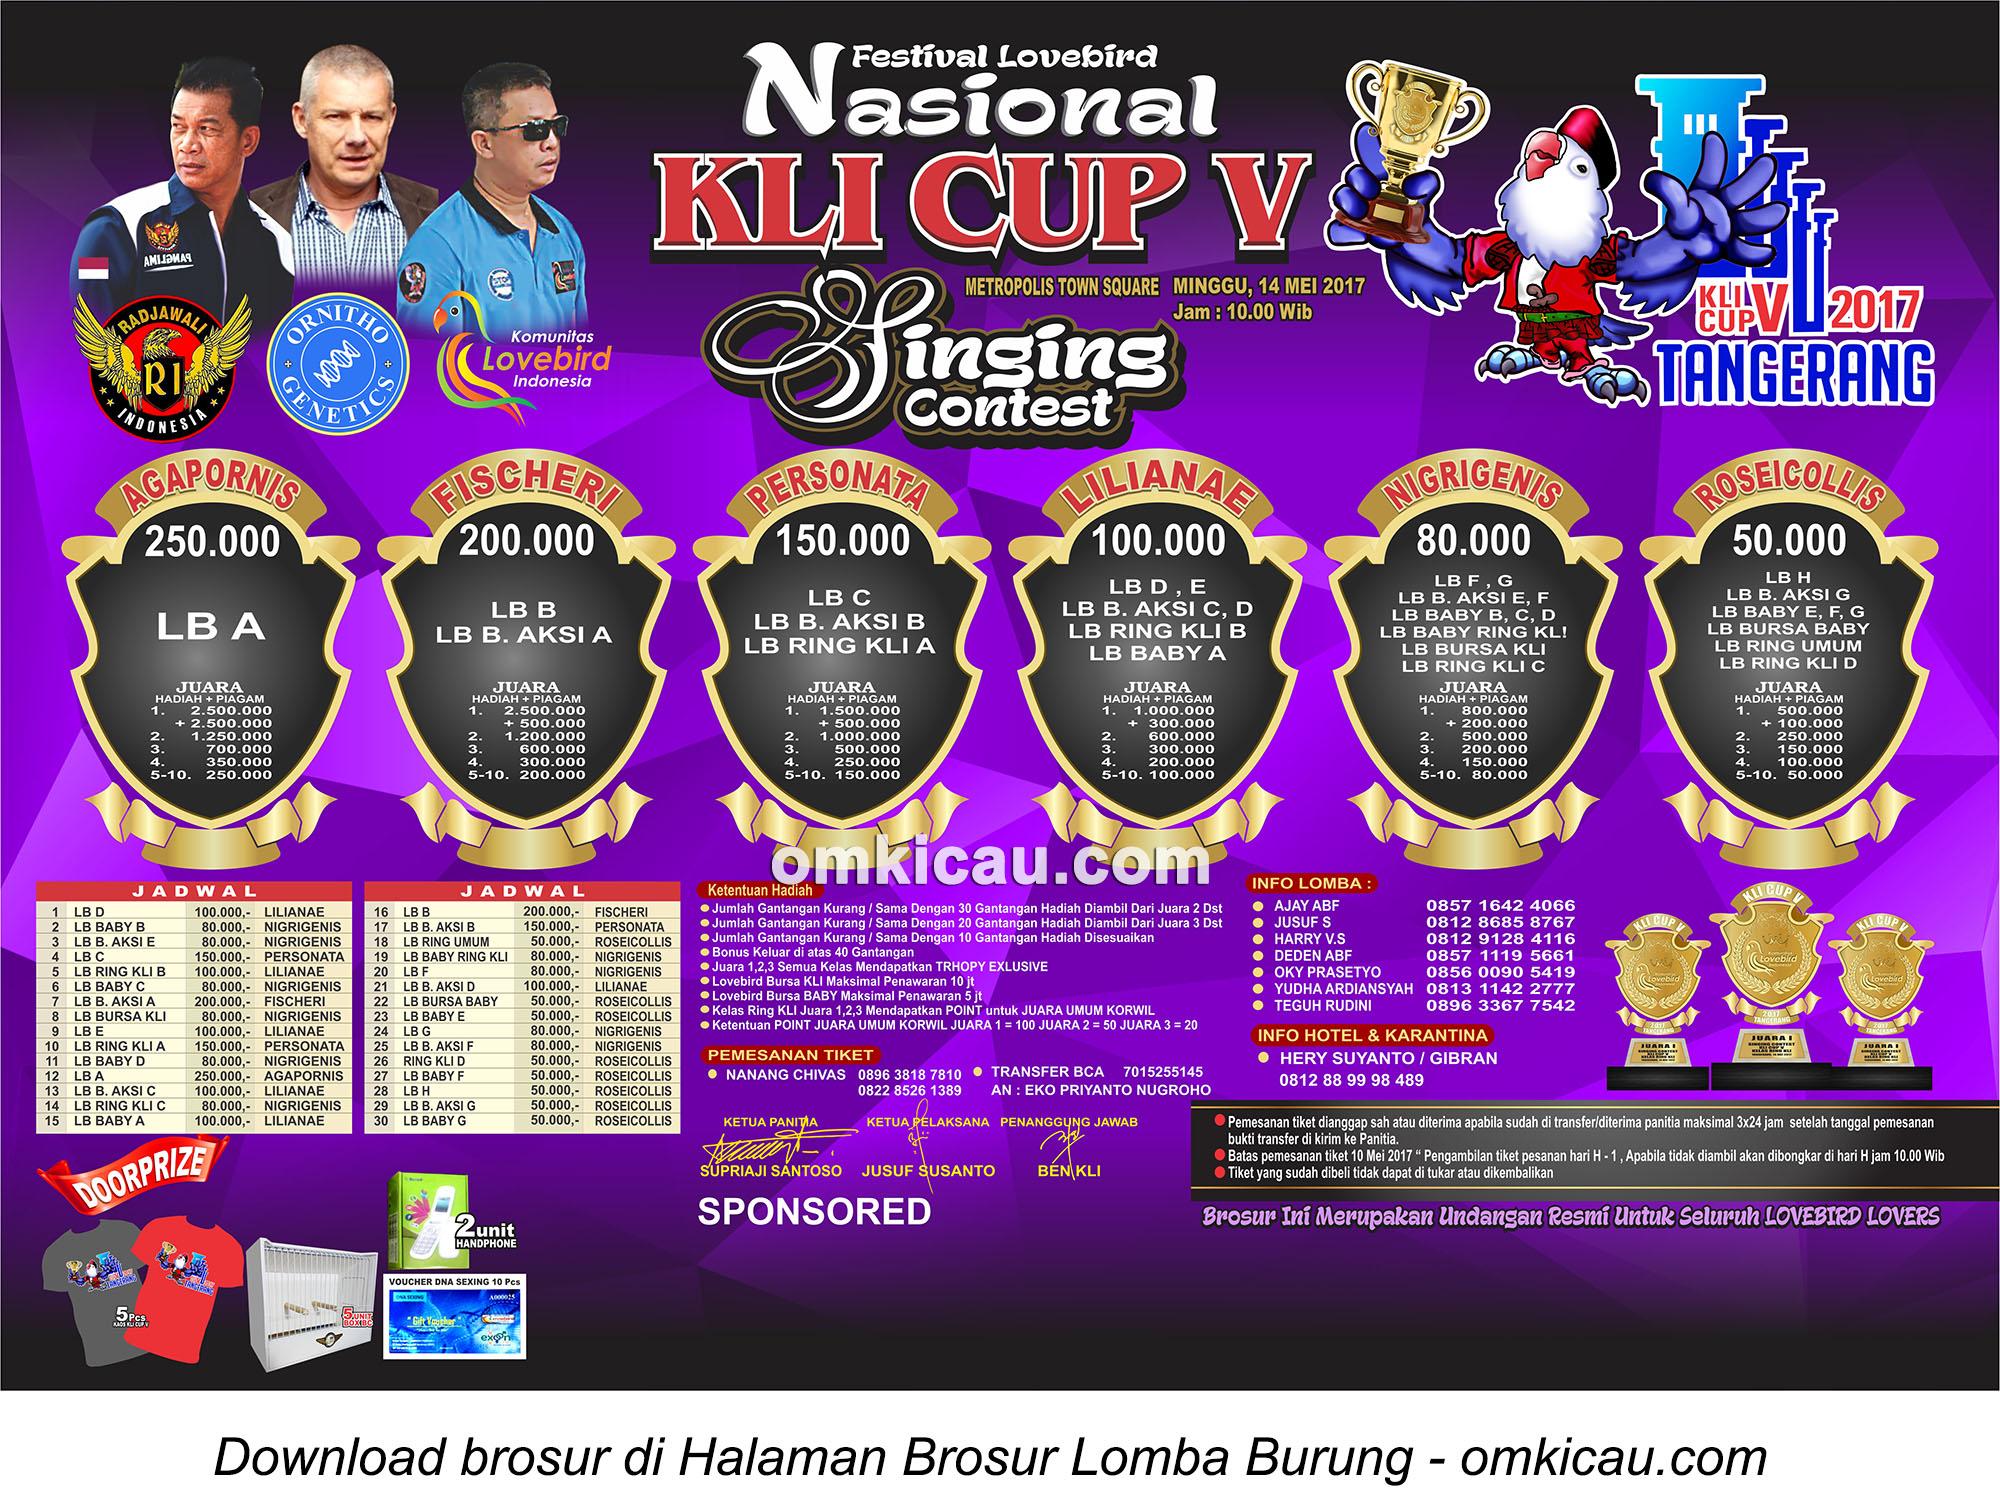 Brosur Lomba Burung Berkicau - Singing Contest KLI Cup V, Tangerang, 14 Mei 2017